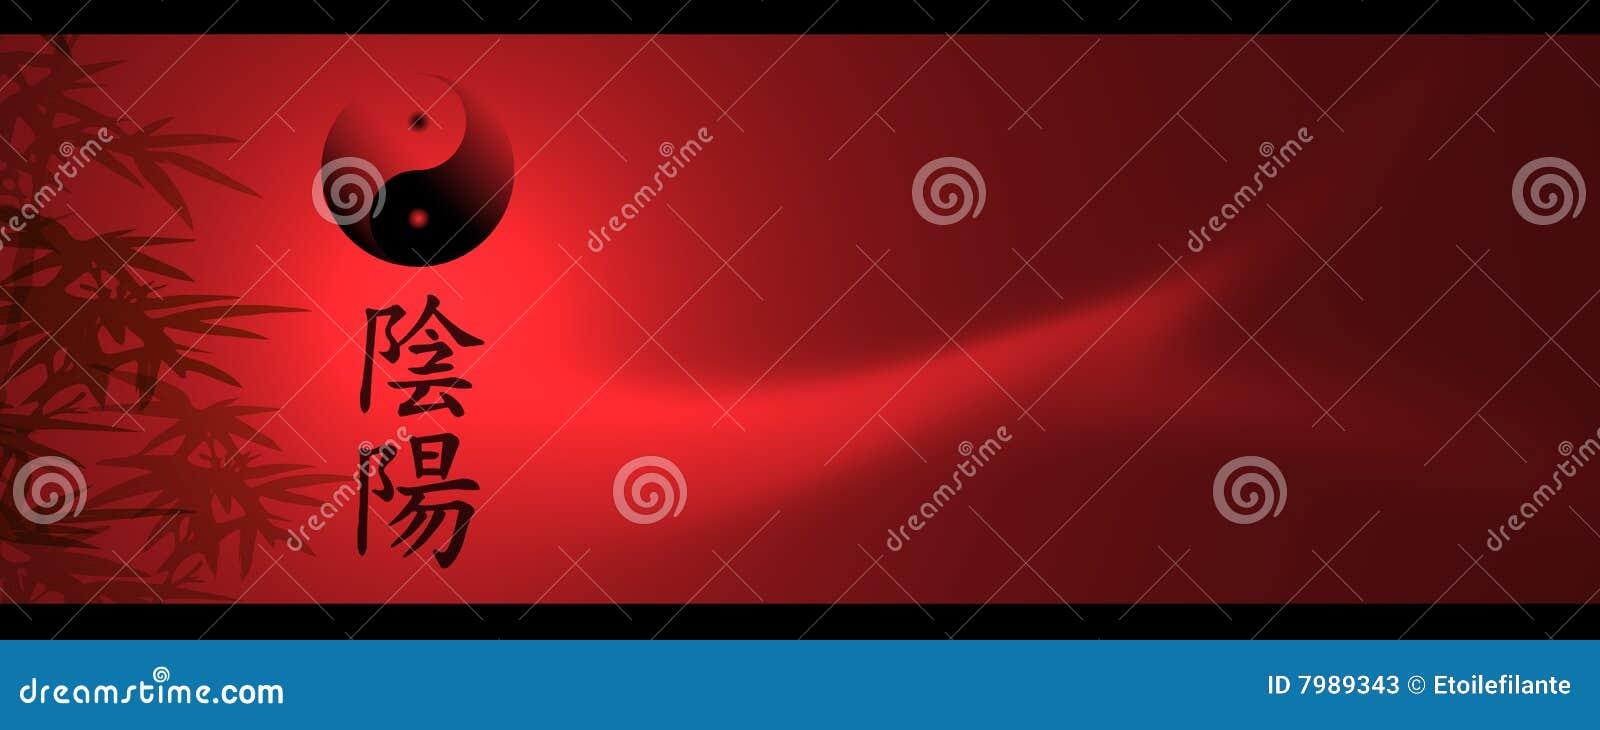 banner yin yang red black stock illustration illustration